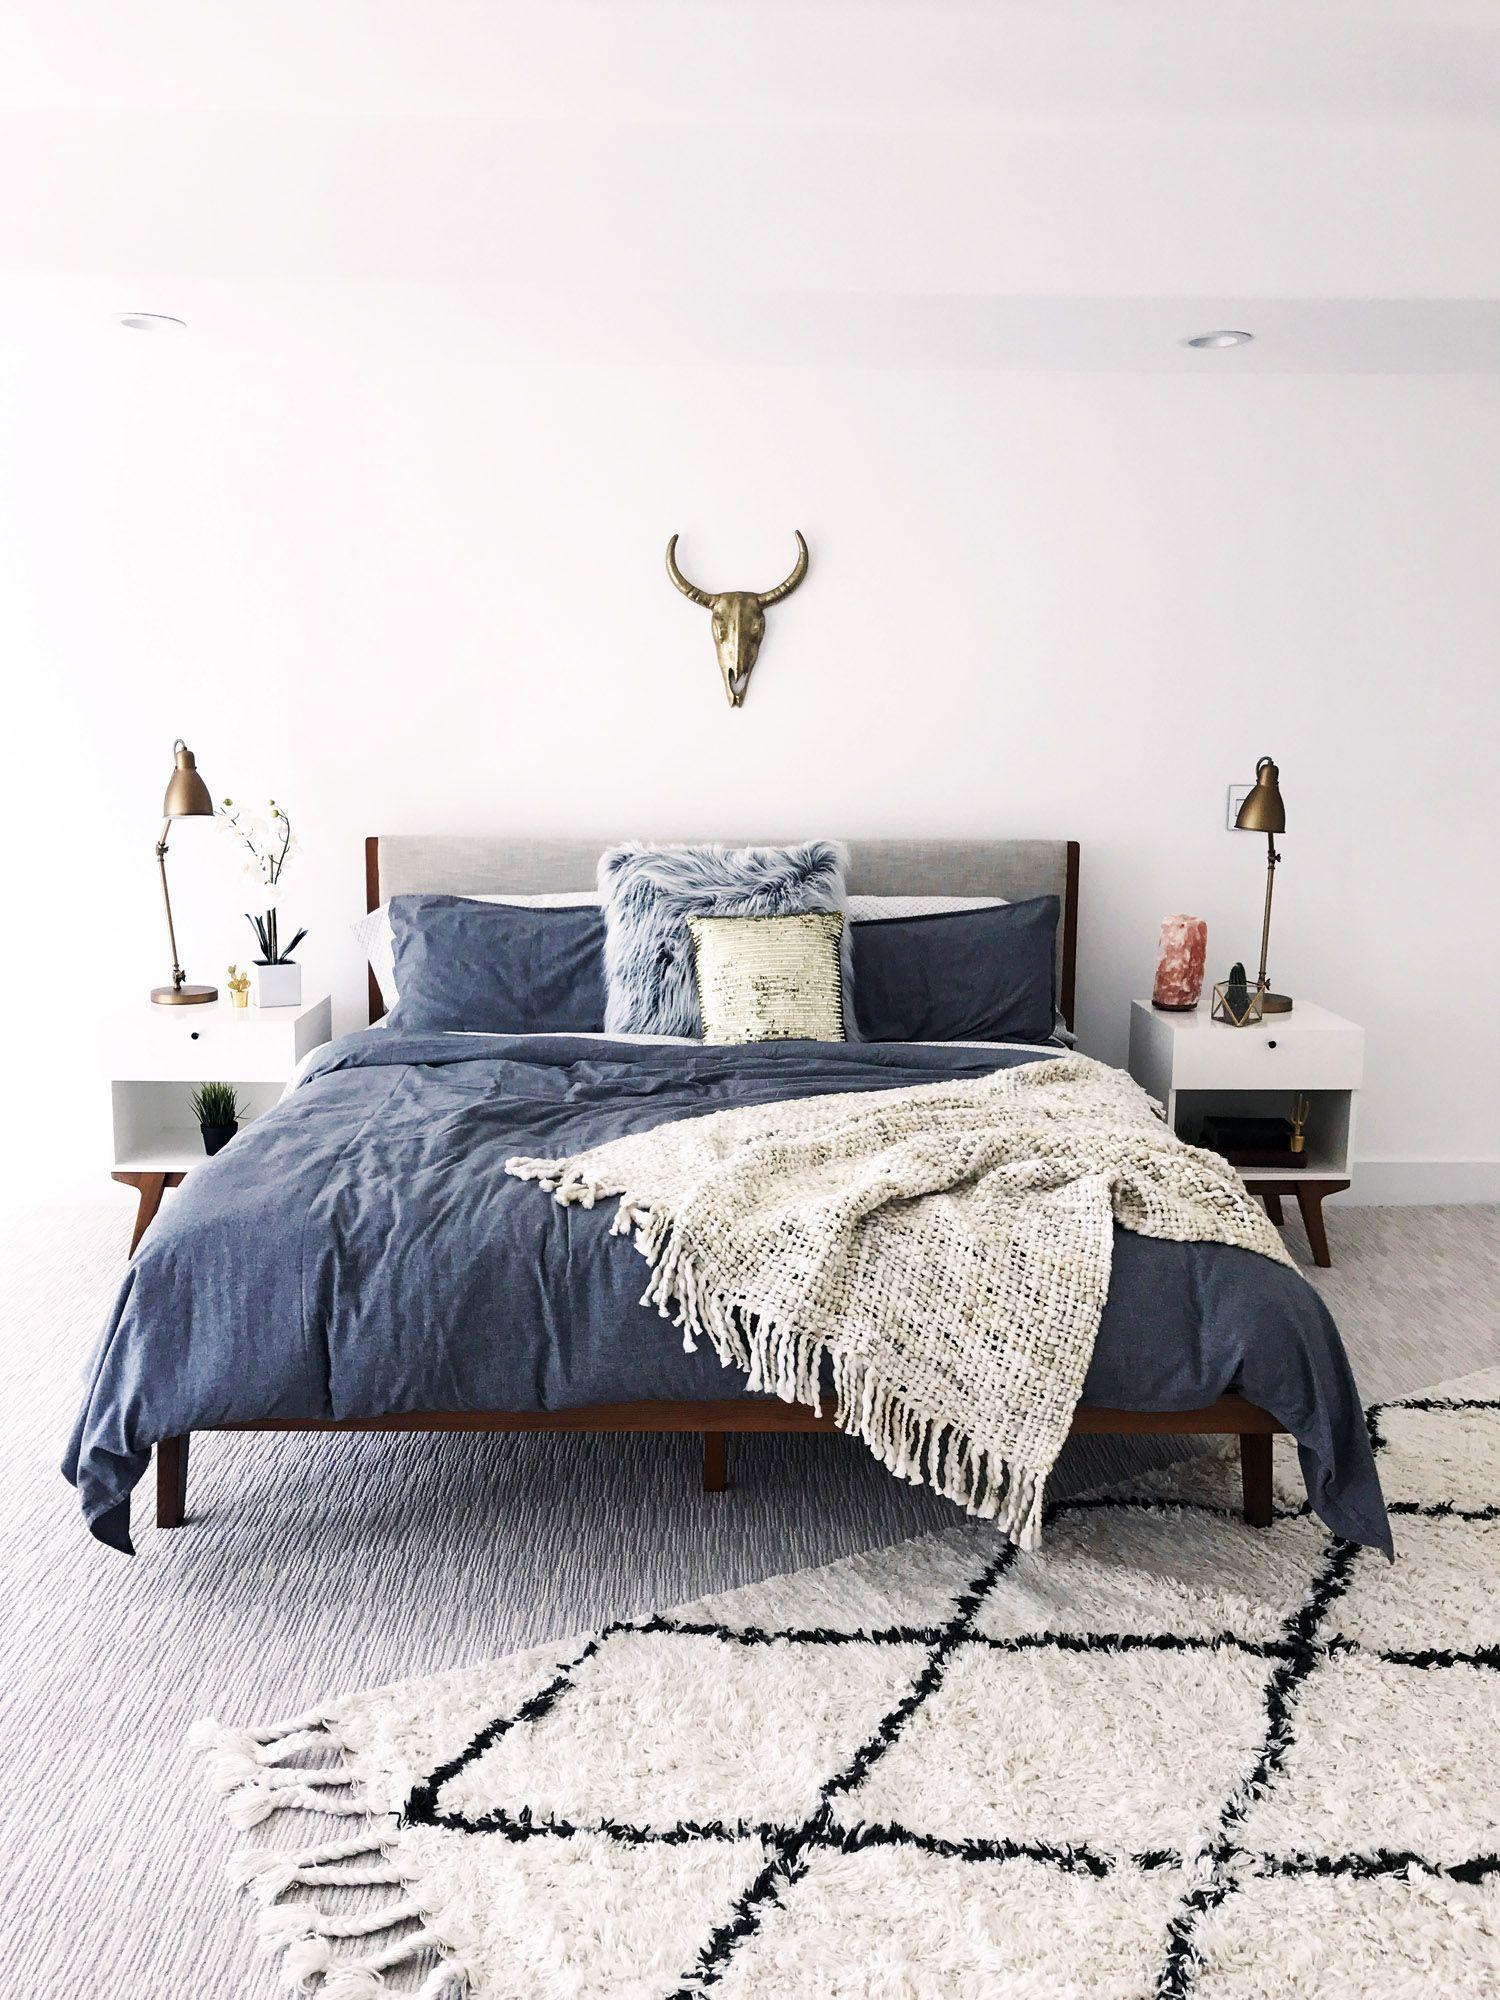 Unique Inspirations The Best Mid Century Bedroom Design